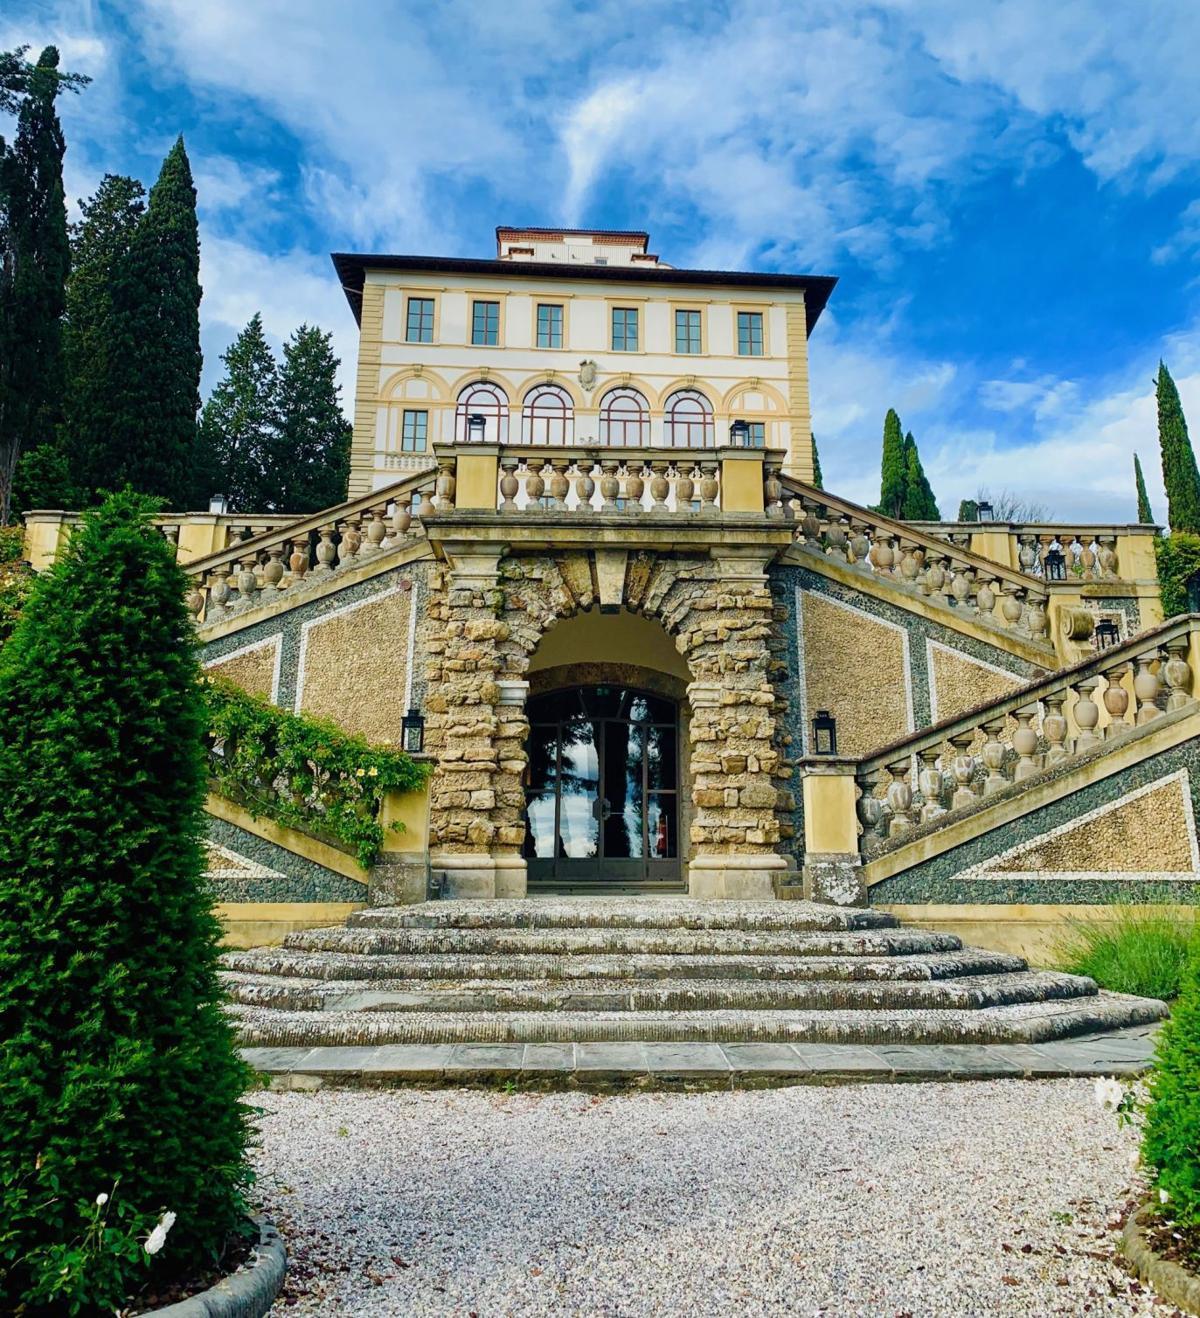 Florentine Splendor